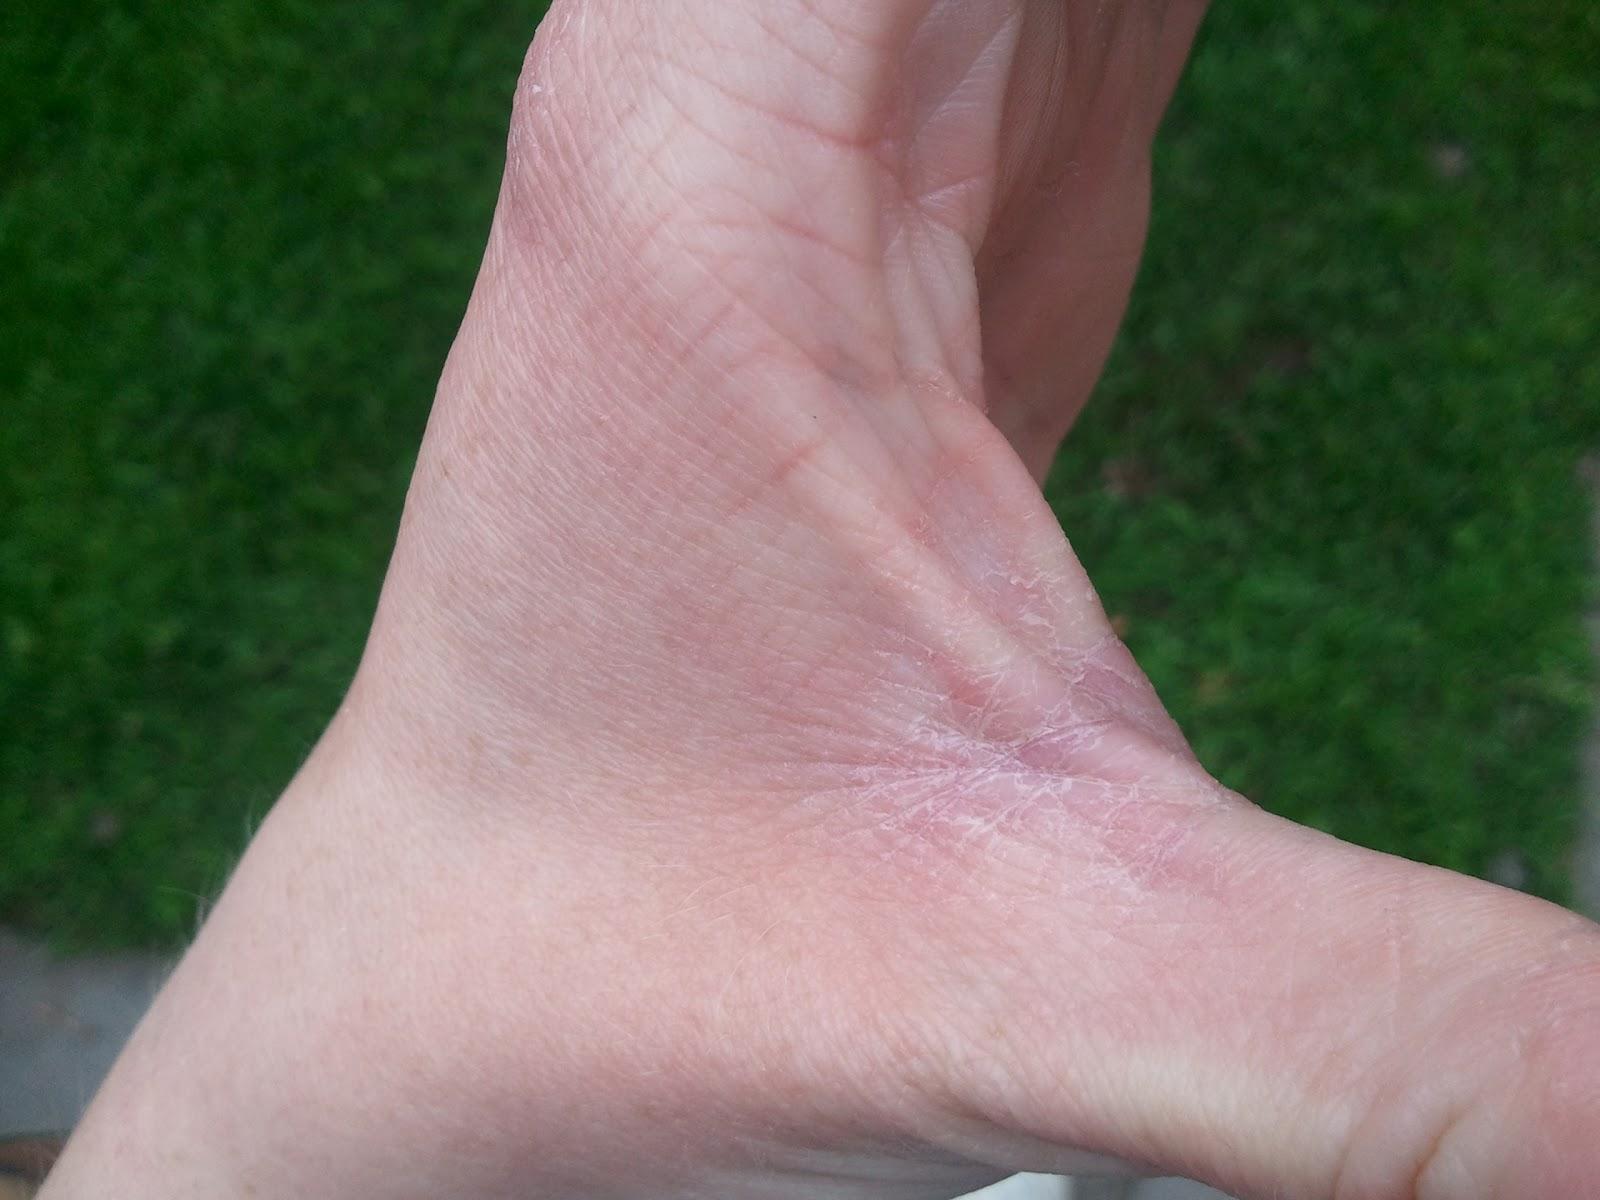 dry skin between fingers #10